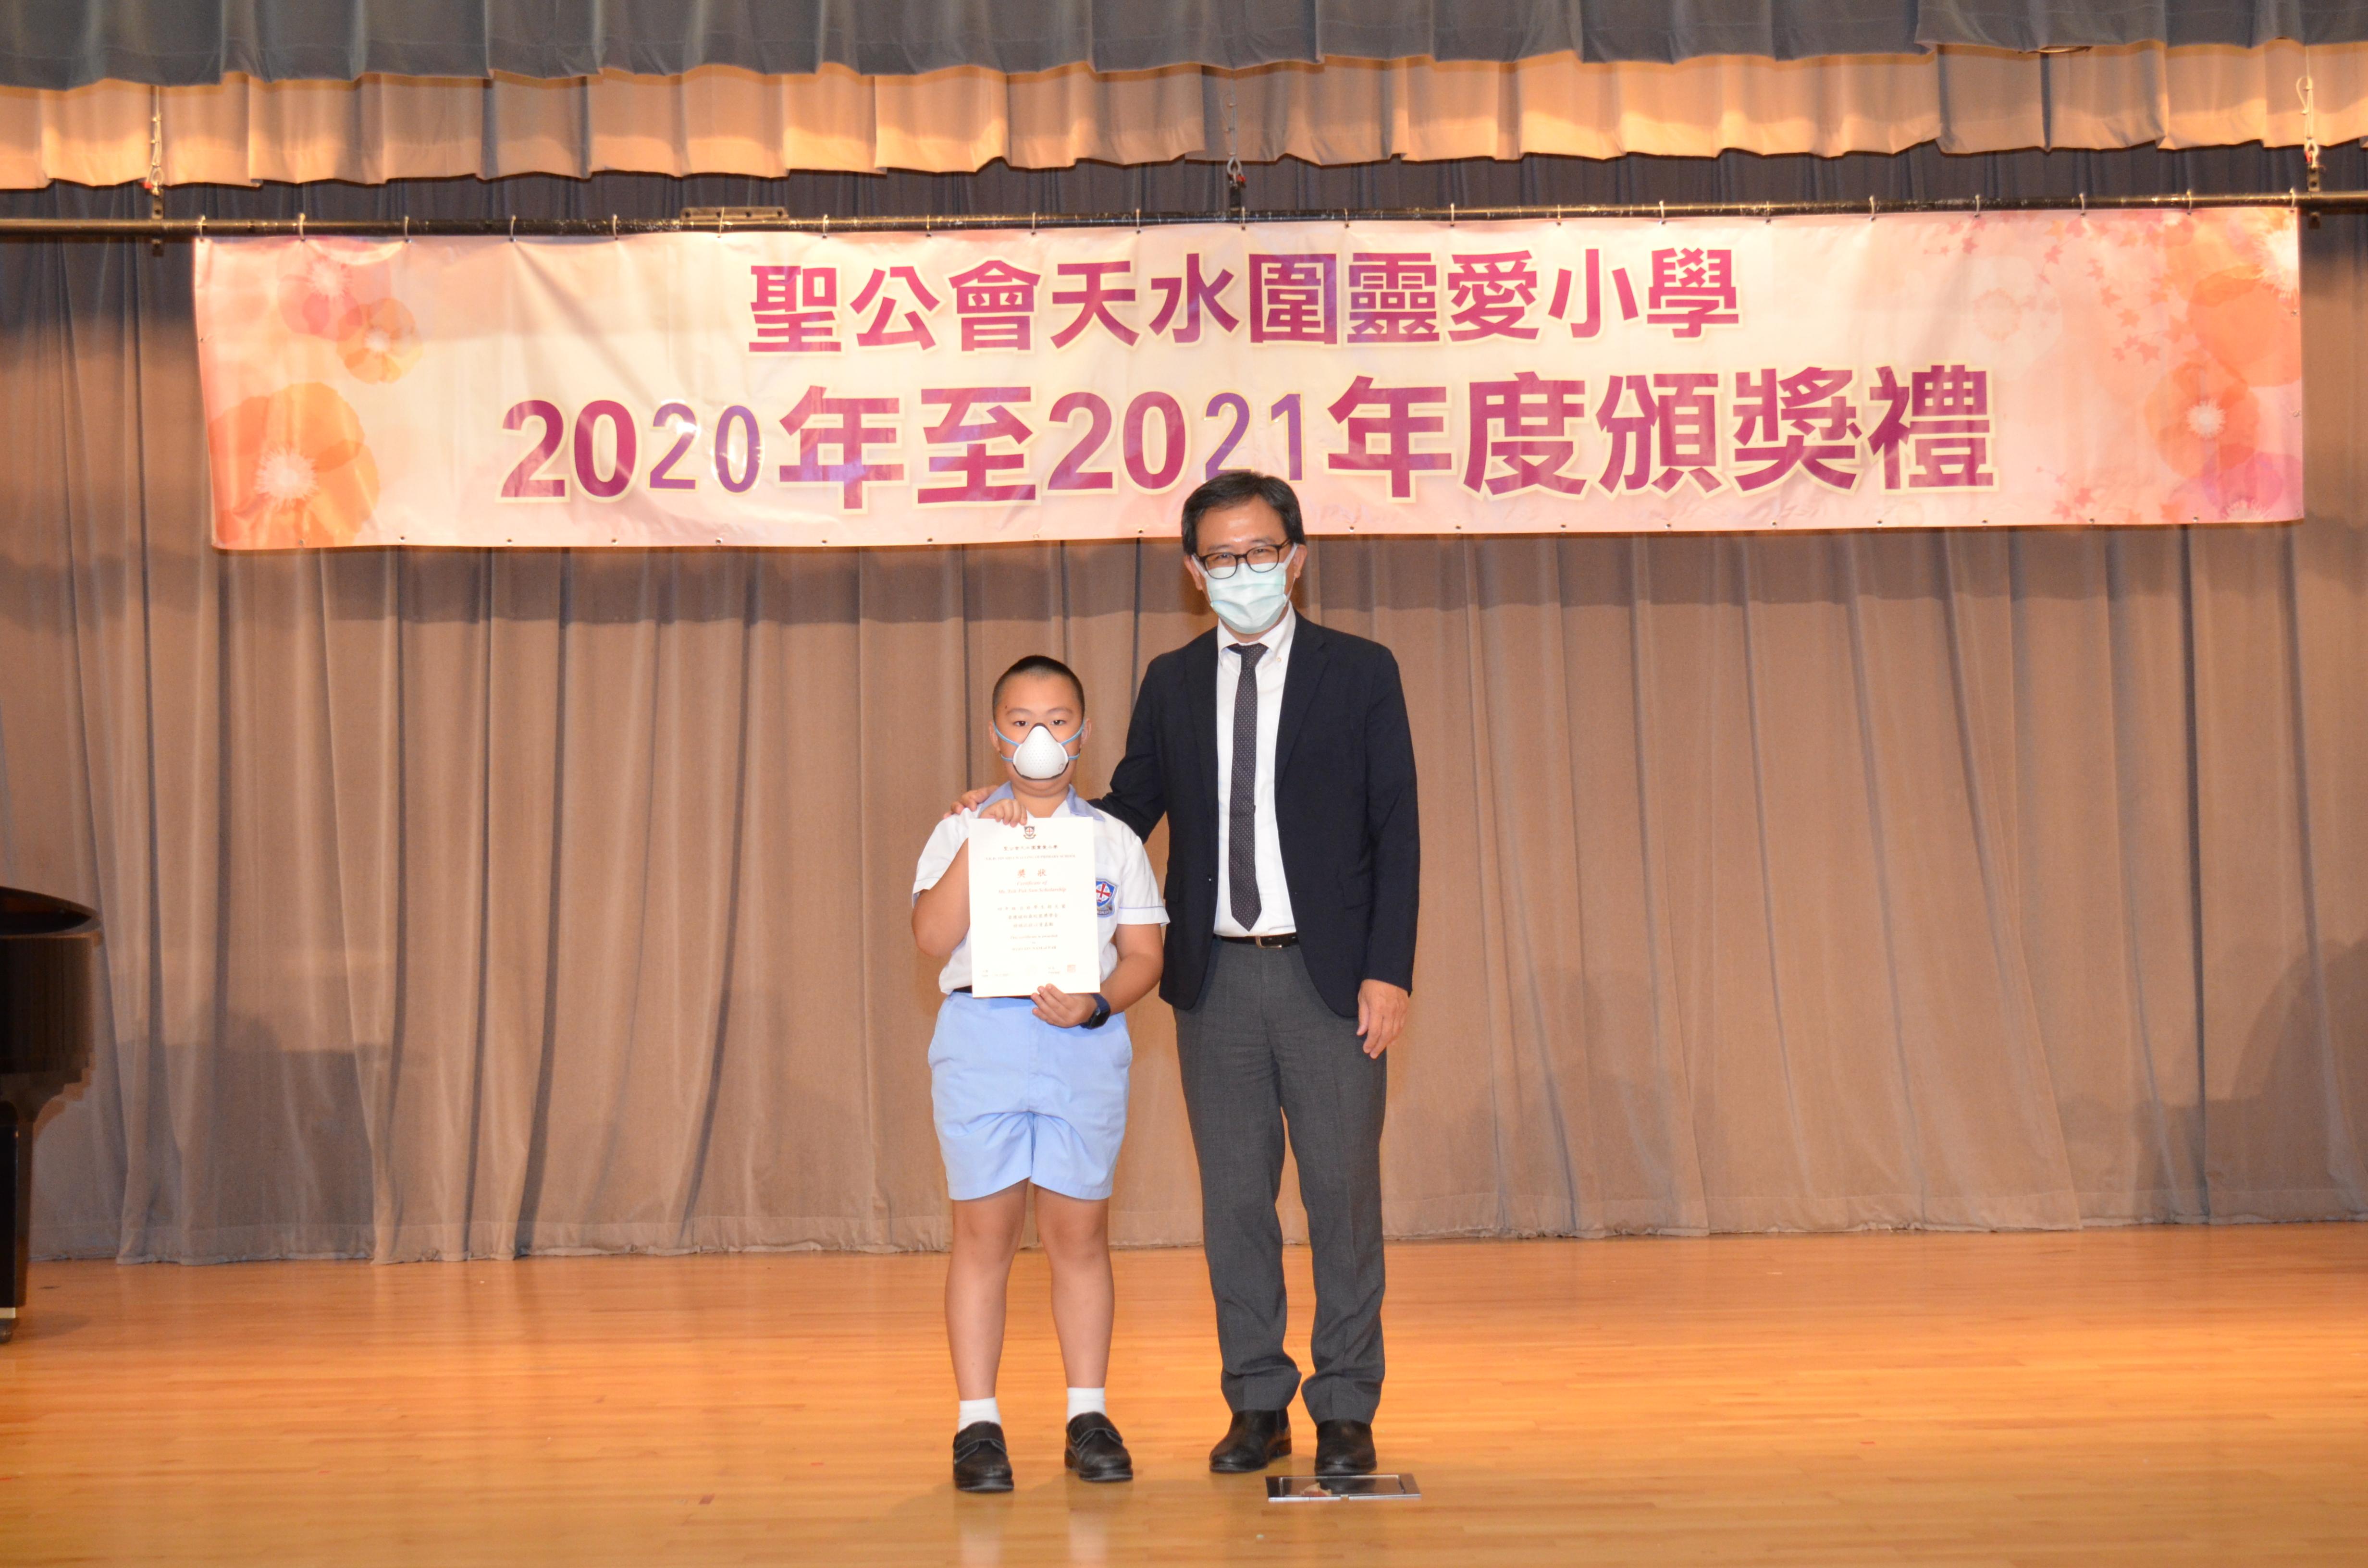 https://skhtswlo.edu.hk/sites/default/files/dsc_3508_1.jpg